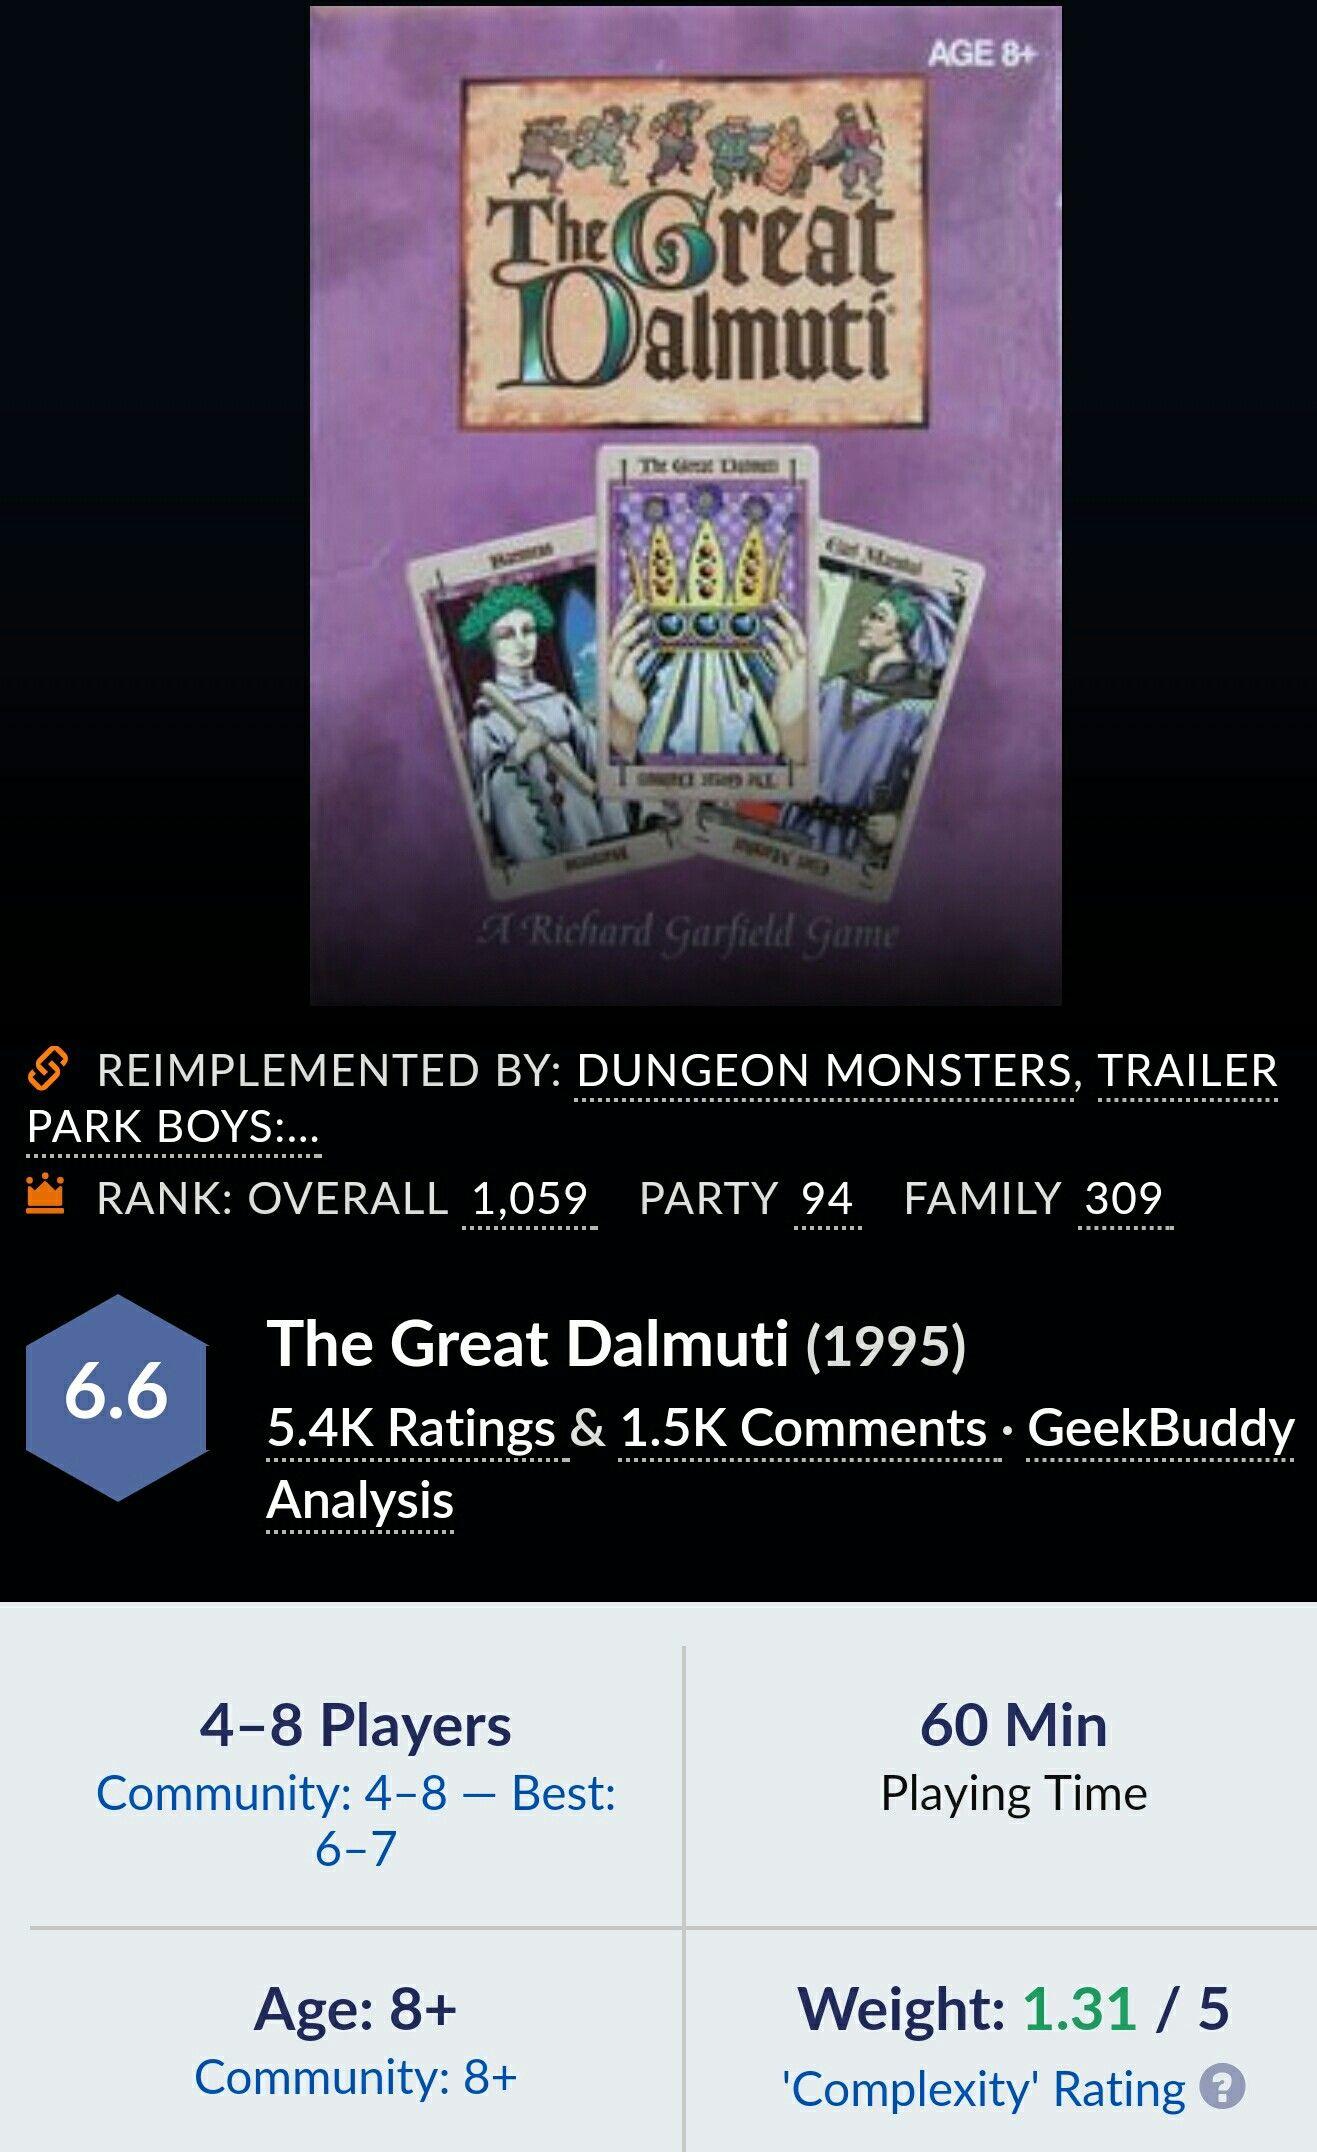 The Great Dalmuti Trailer park boys, Trailer park, Greatful